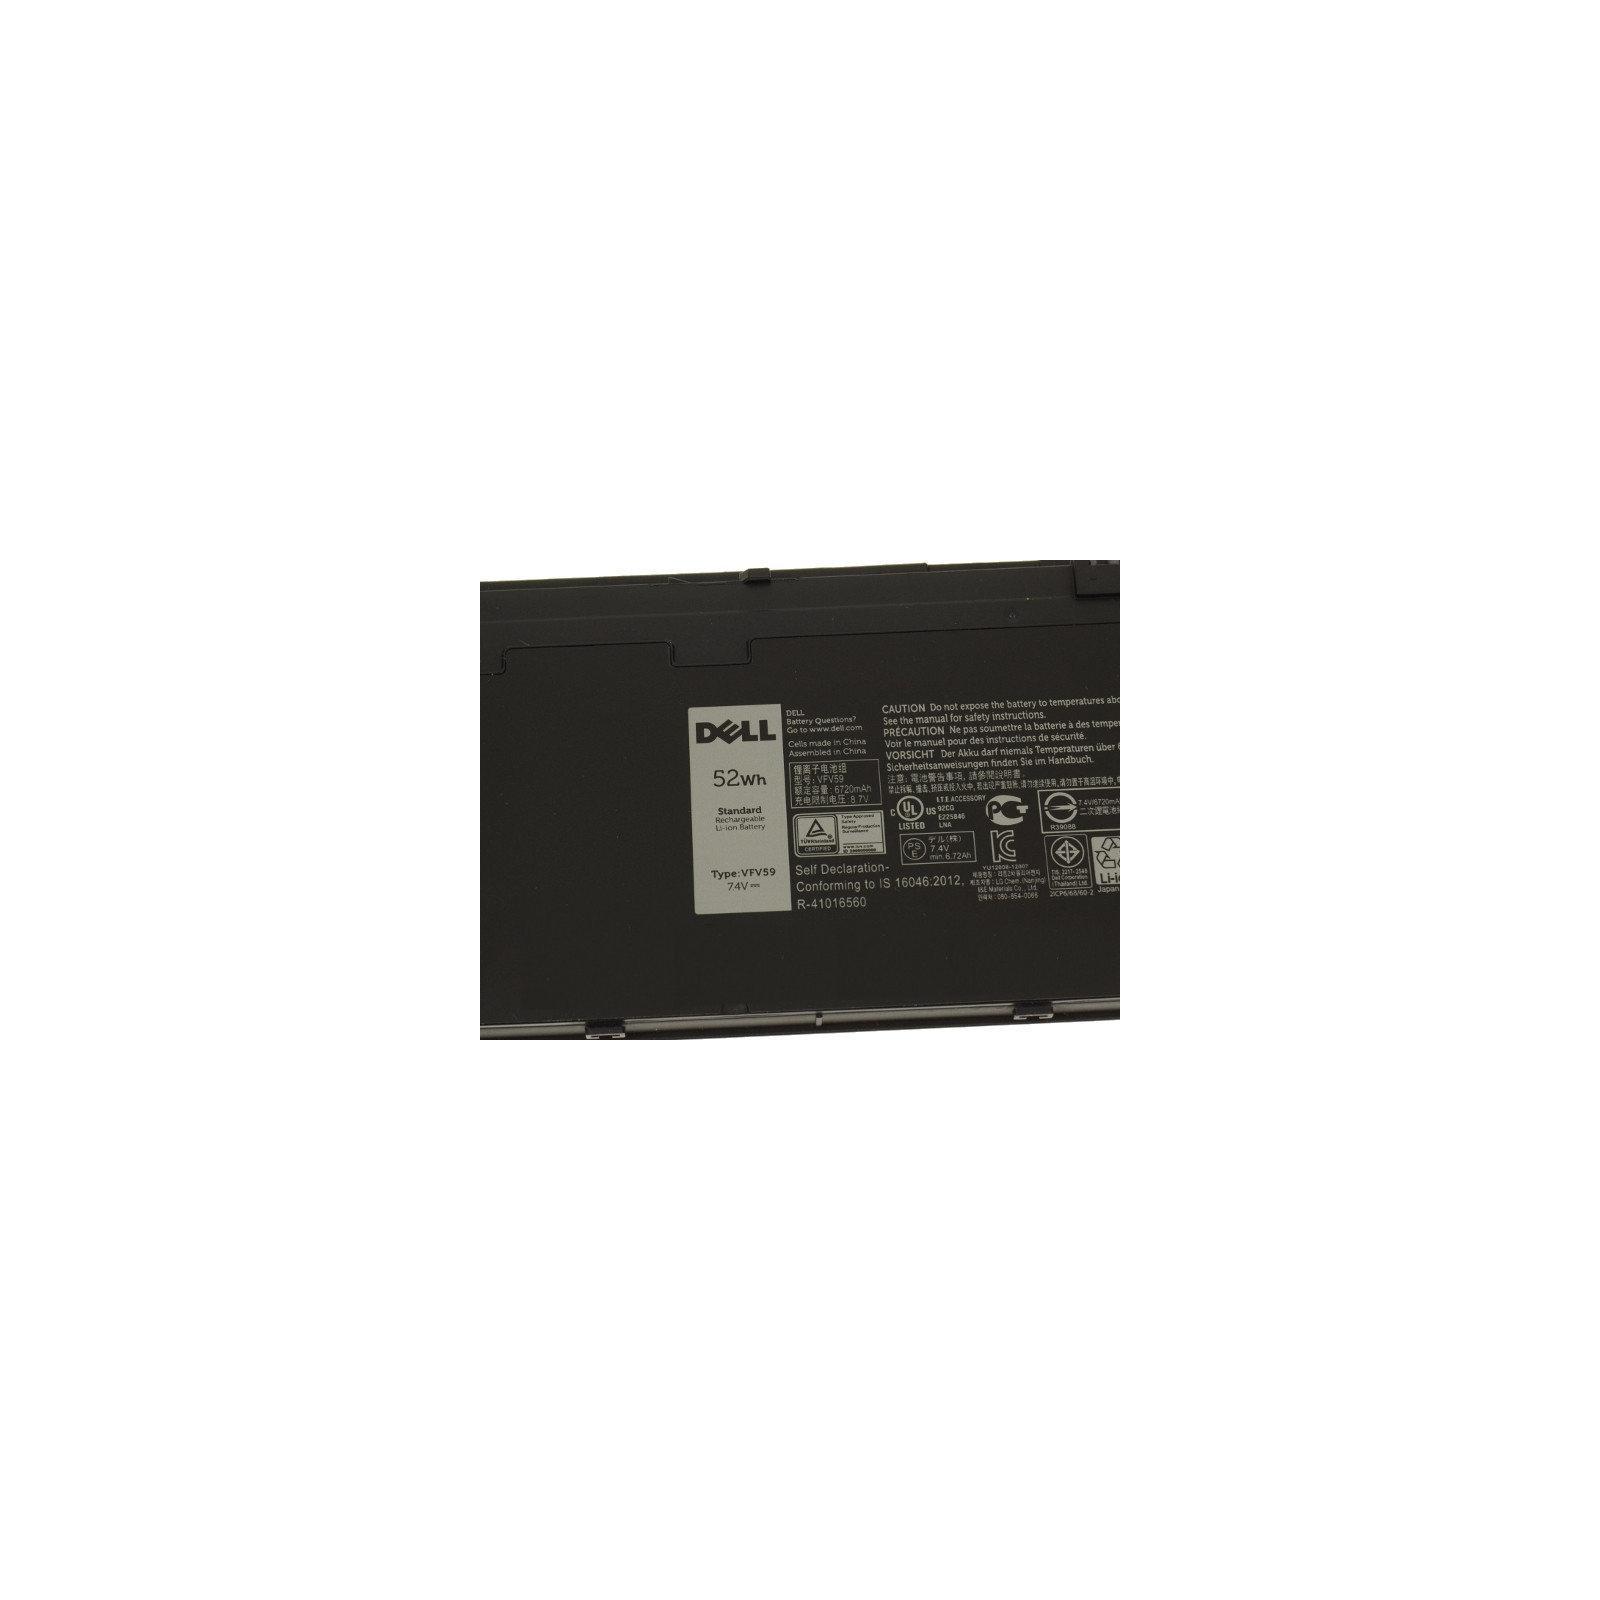 Аккумулятор для ноутбука Dell Latitude E7250 VFV59, 6720mAh (52Wh), 6cell, 7.4V (A47164) изображение 3